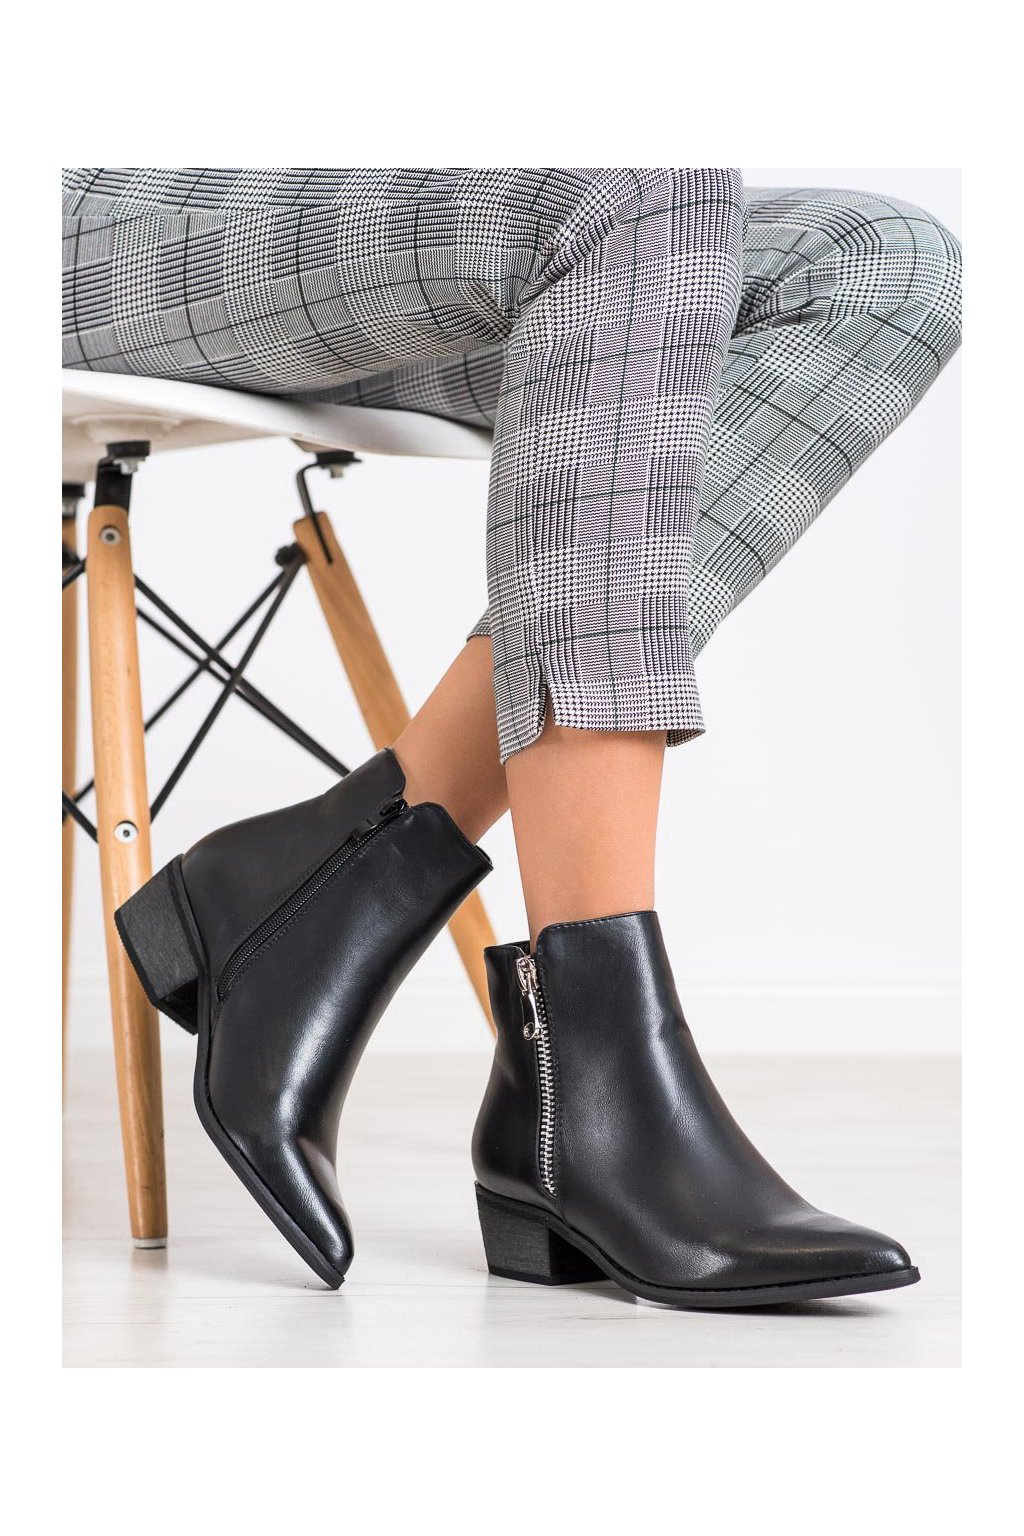 Čierne dámske topánky Queentina kod BJ1565B